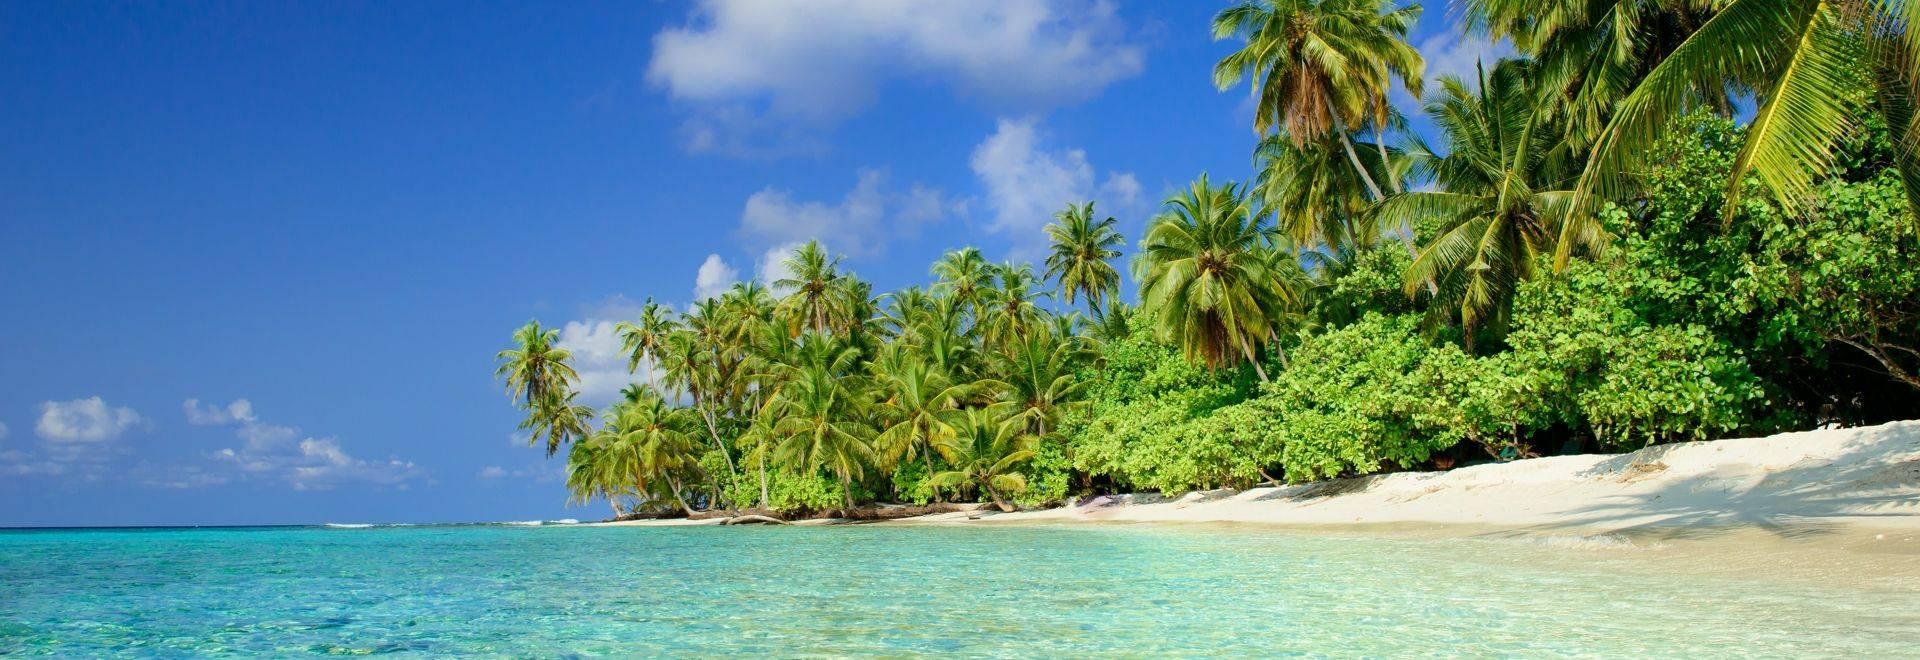 Wildlife Holidays In The Maldives Naturetrek